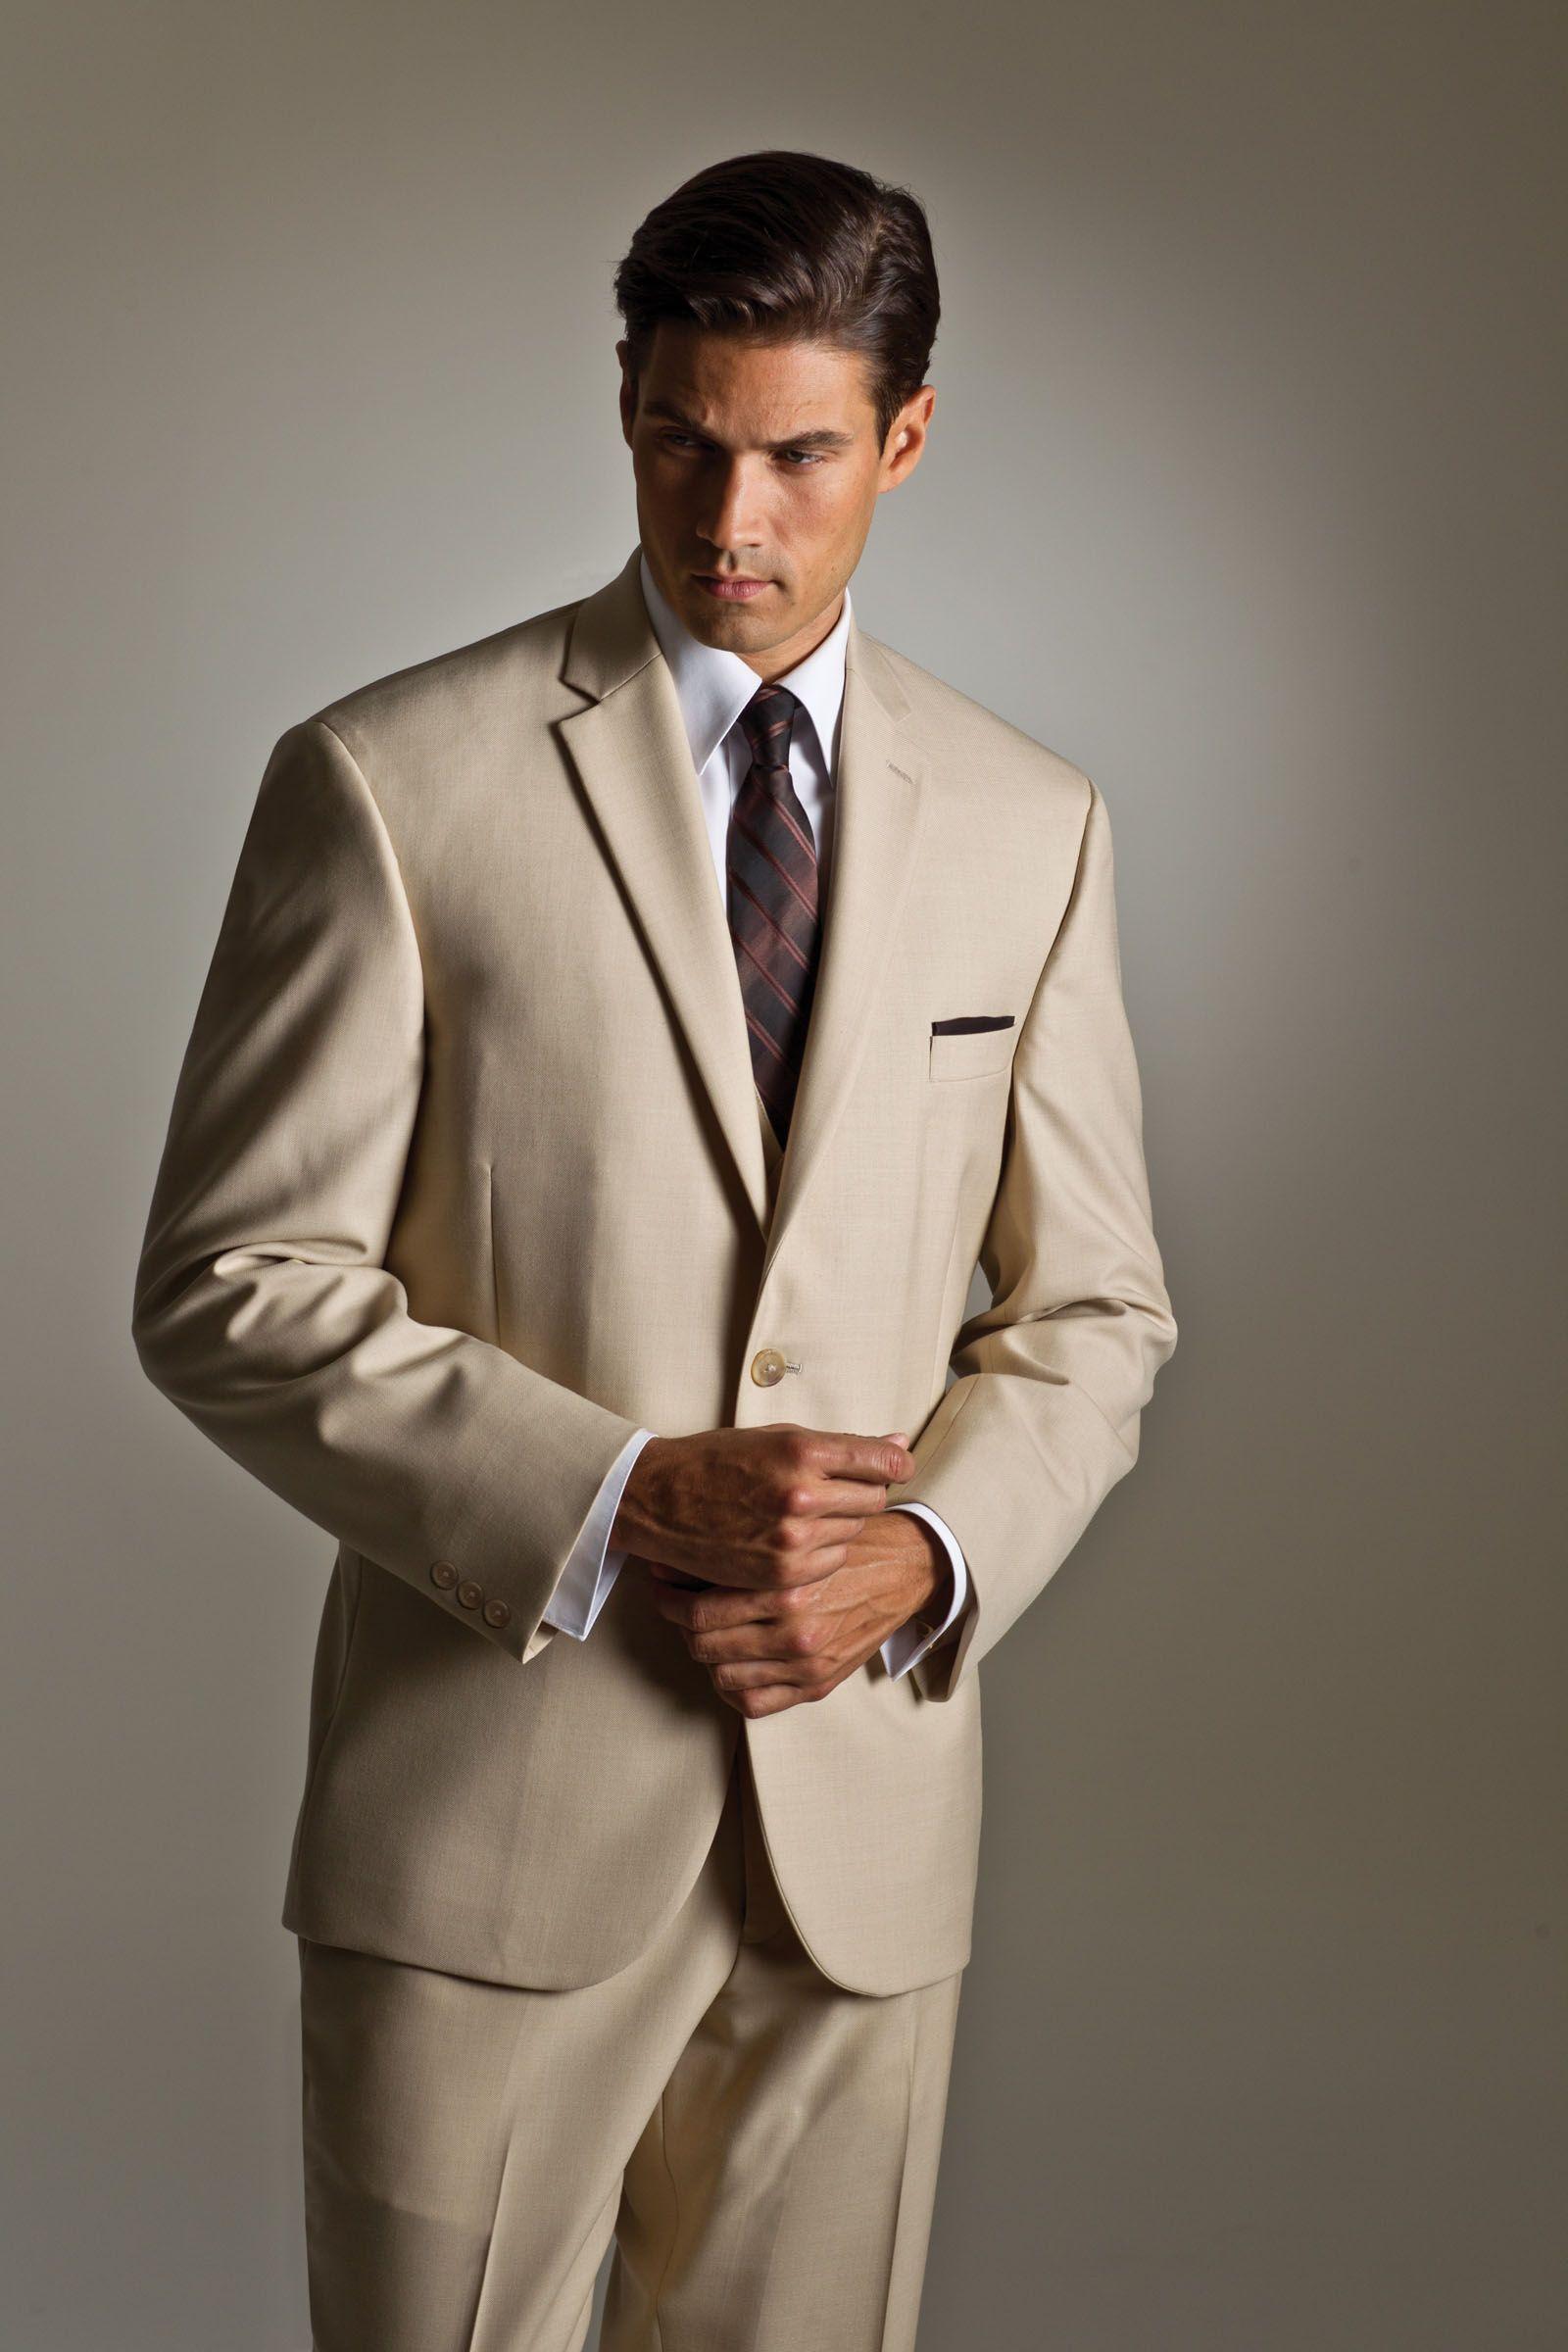 Lord West Horizon Tan Suit Available April 1, 2014